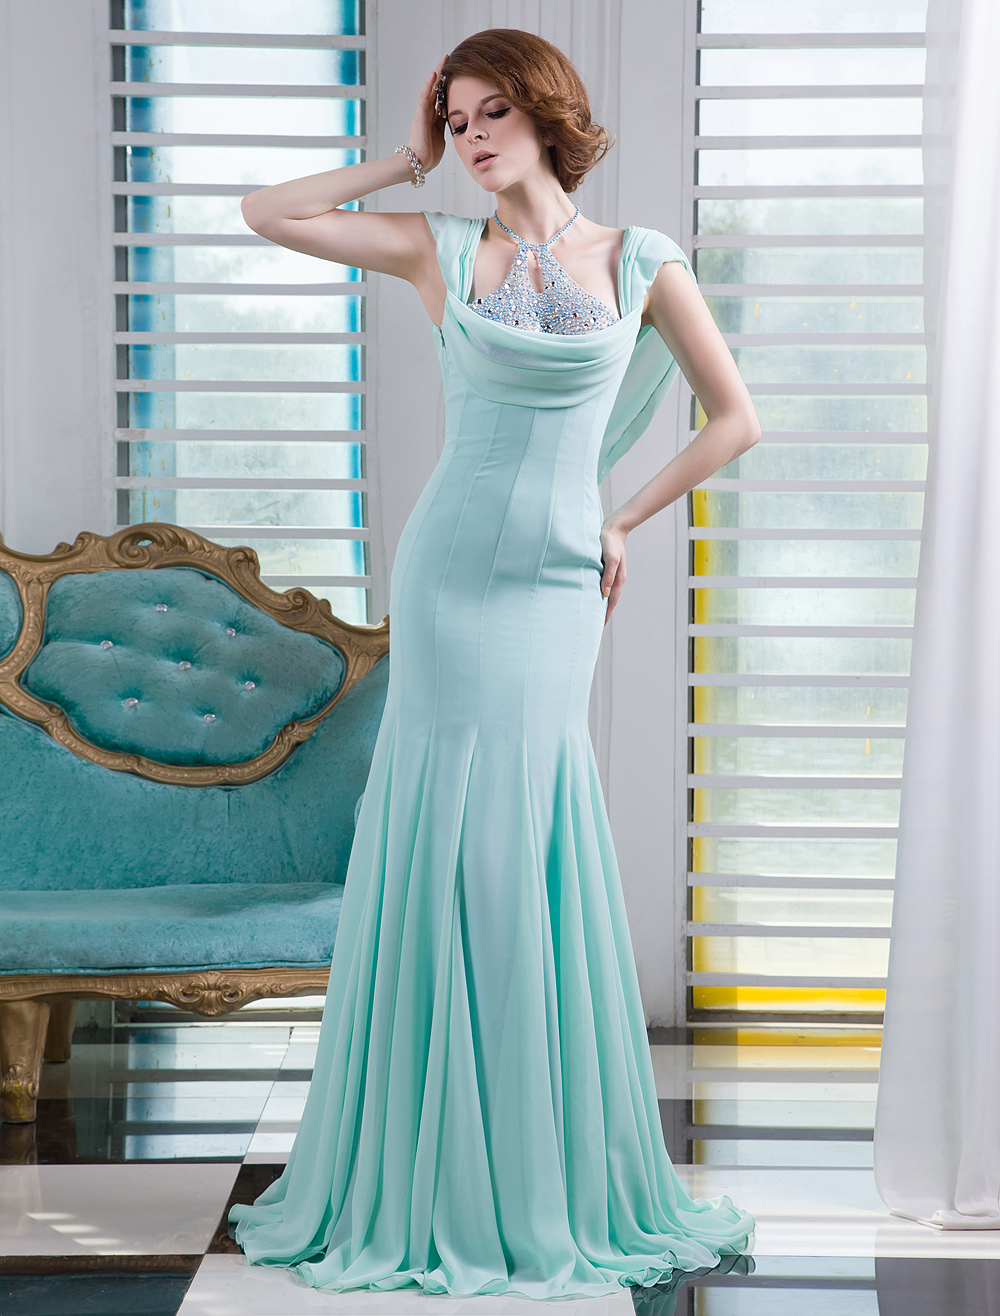 Mint Green Beading Halter Short Sleeves Mermaid Chiffon Evening Dress Milanoo (Wedding Evening Dresses) photo